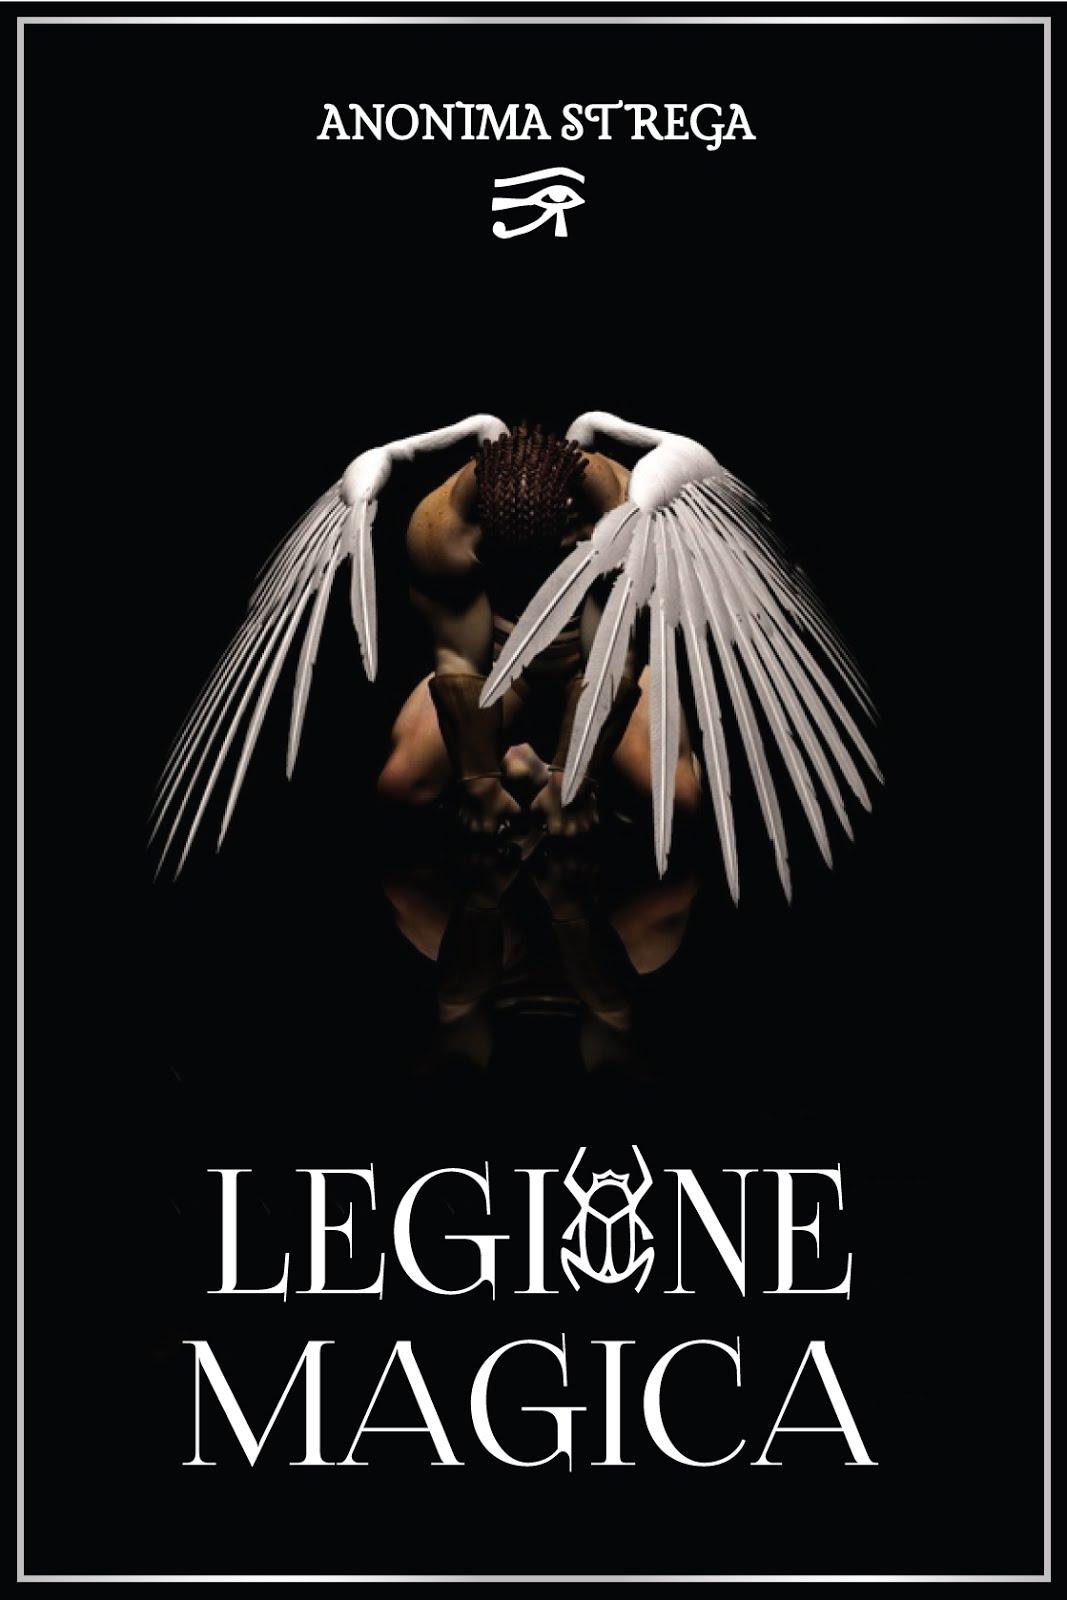 Legione Magica - Urban Fantasy/Paranormal Romance